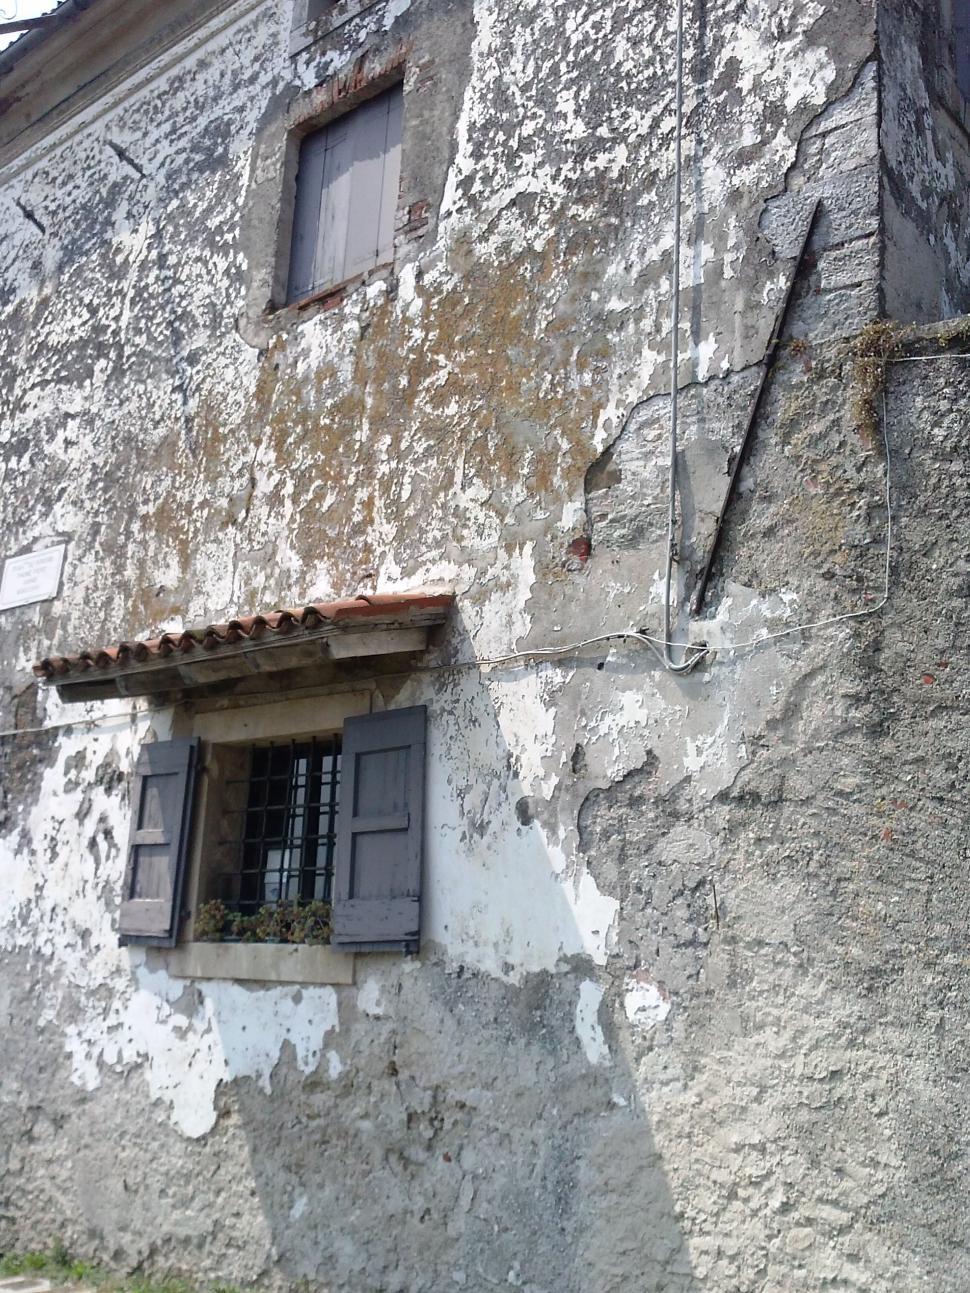 Download Free Stock HD Photo of Giardini e ville Online